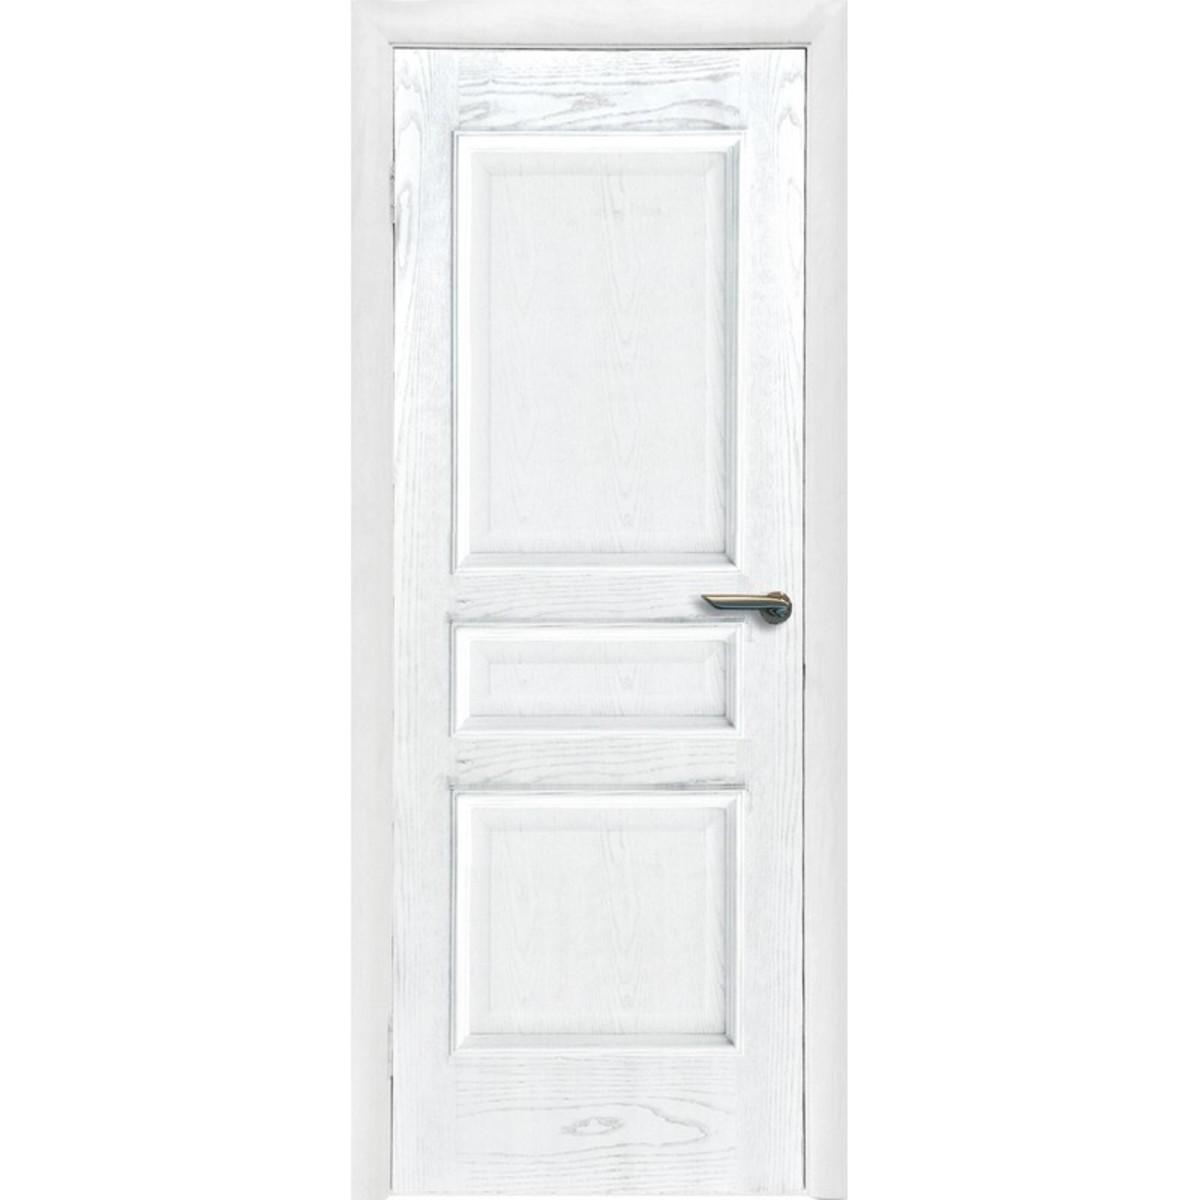 Дверь Межкомнатная Глухая Корона 80x200 Шпон Цвет Ясень